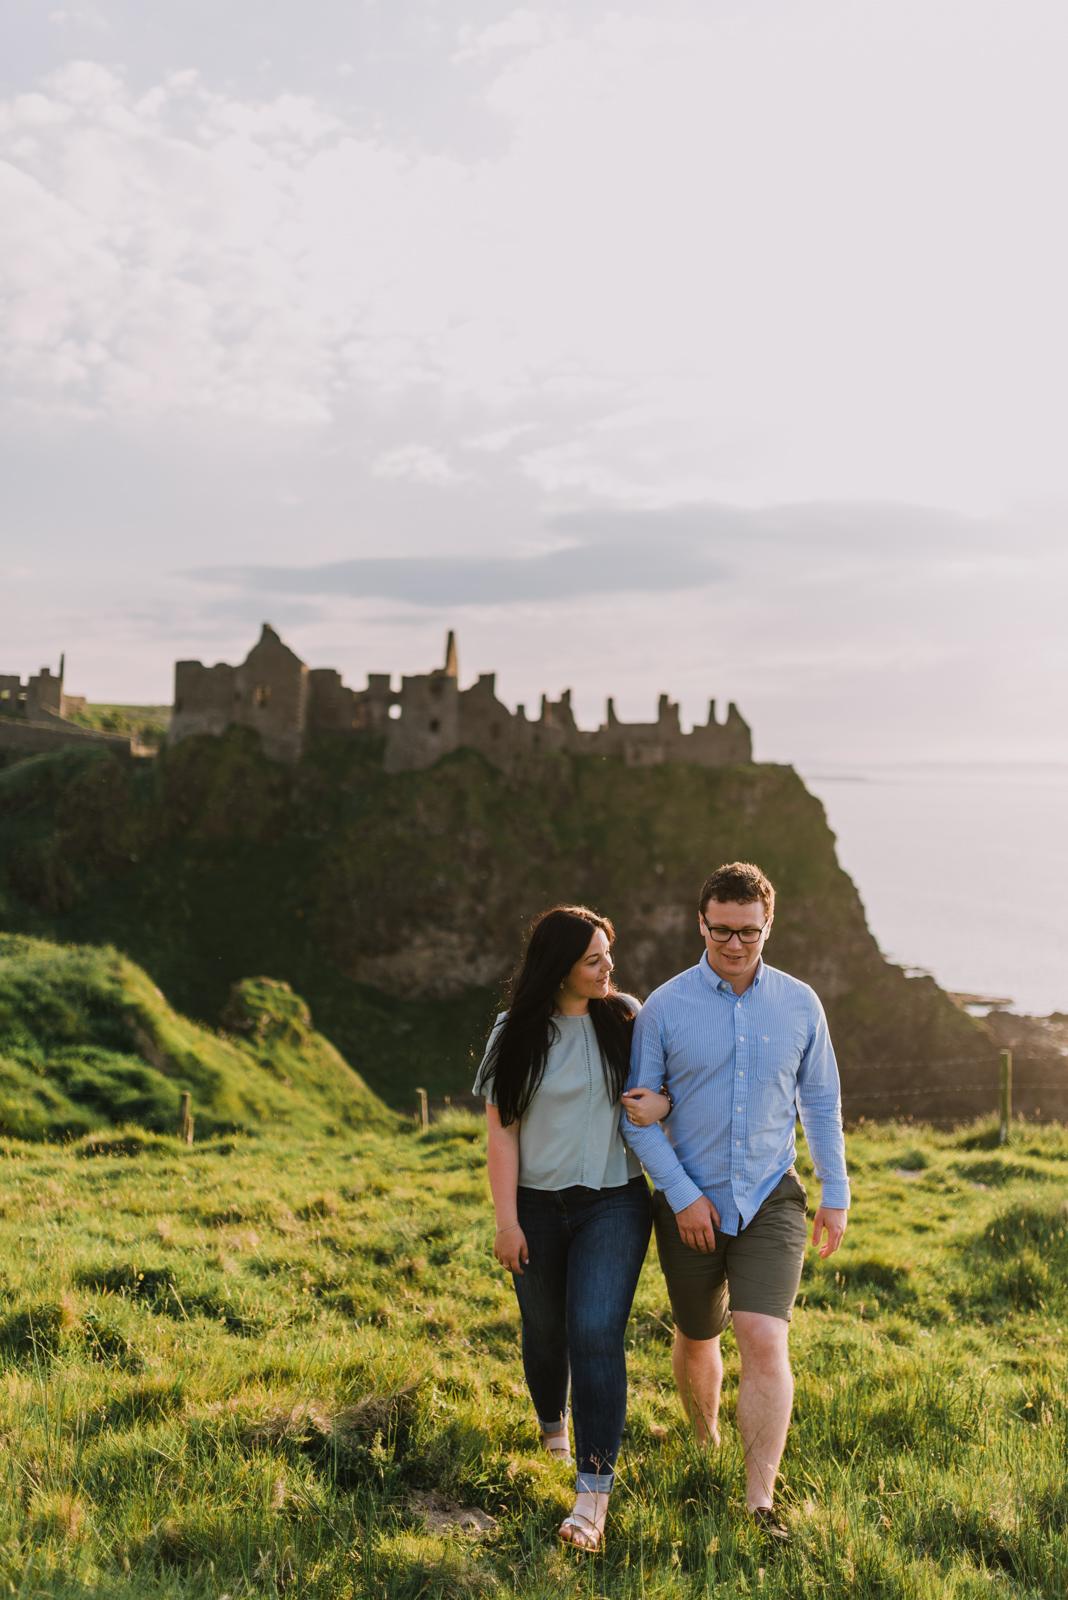 sunset engagement photos by Hello, Sugar taken at Dunluce Castle, Northern Ireland-16.jpg